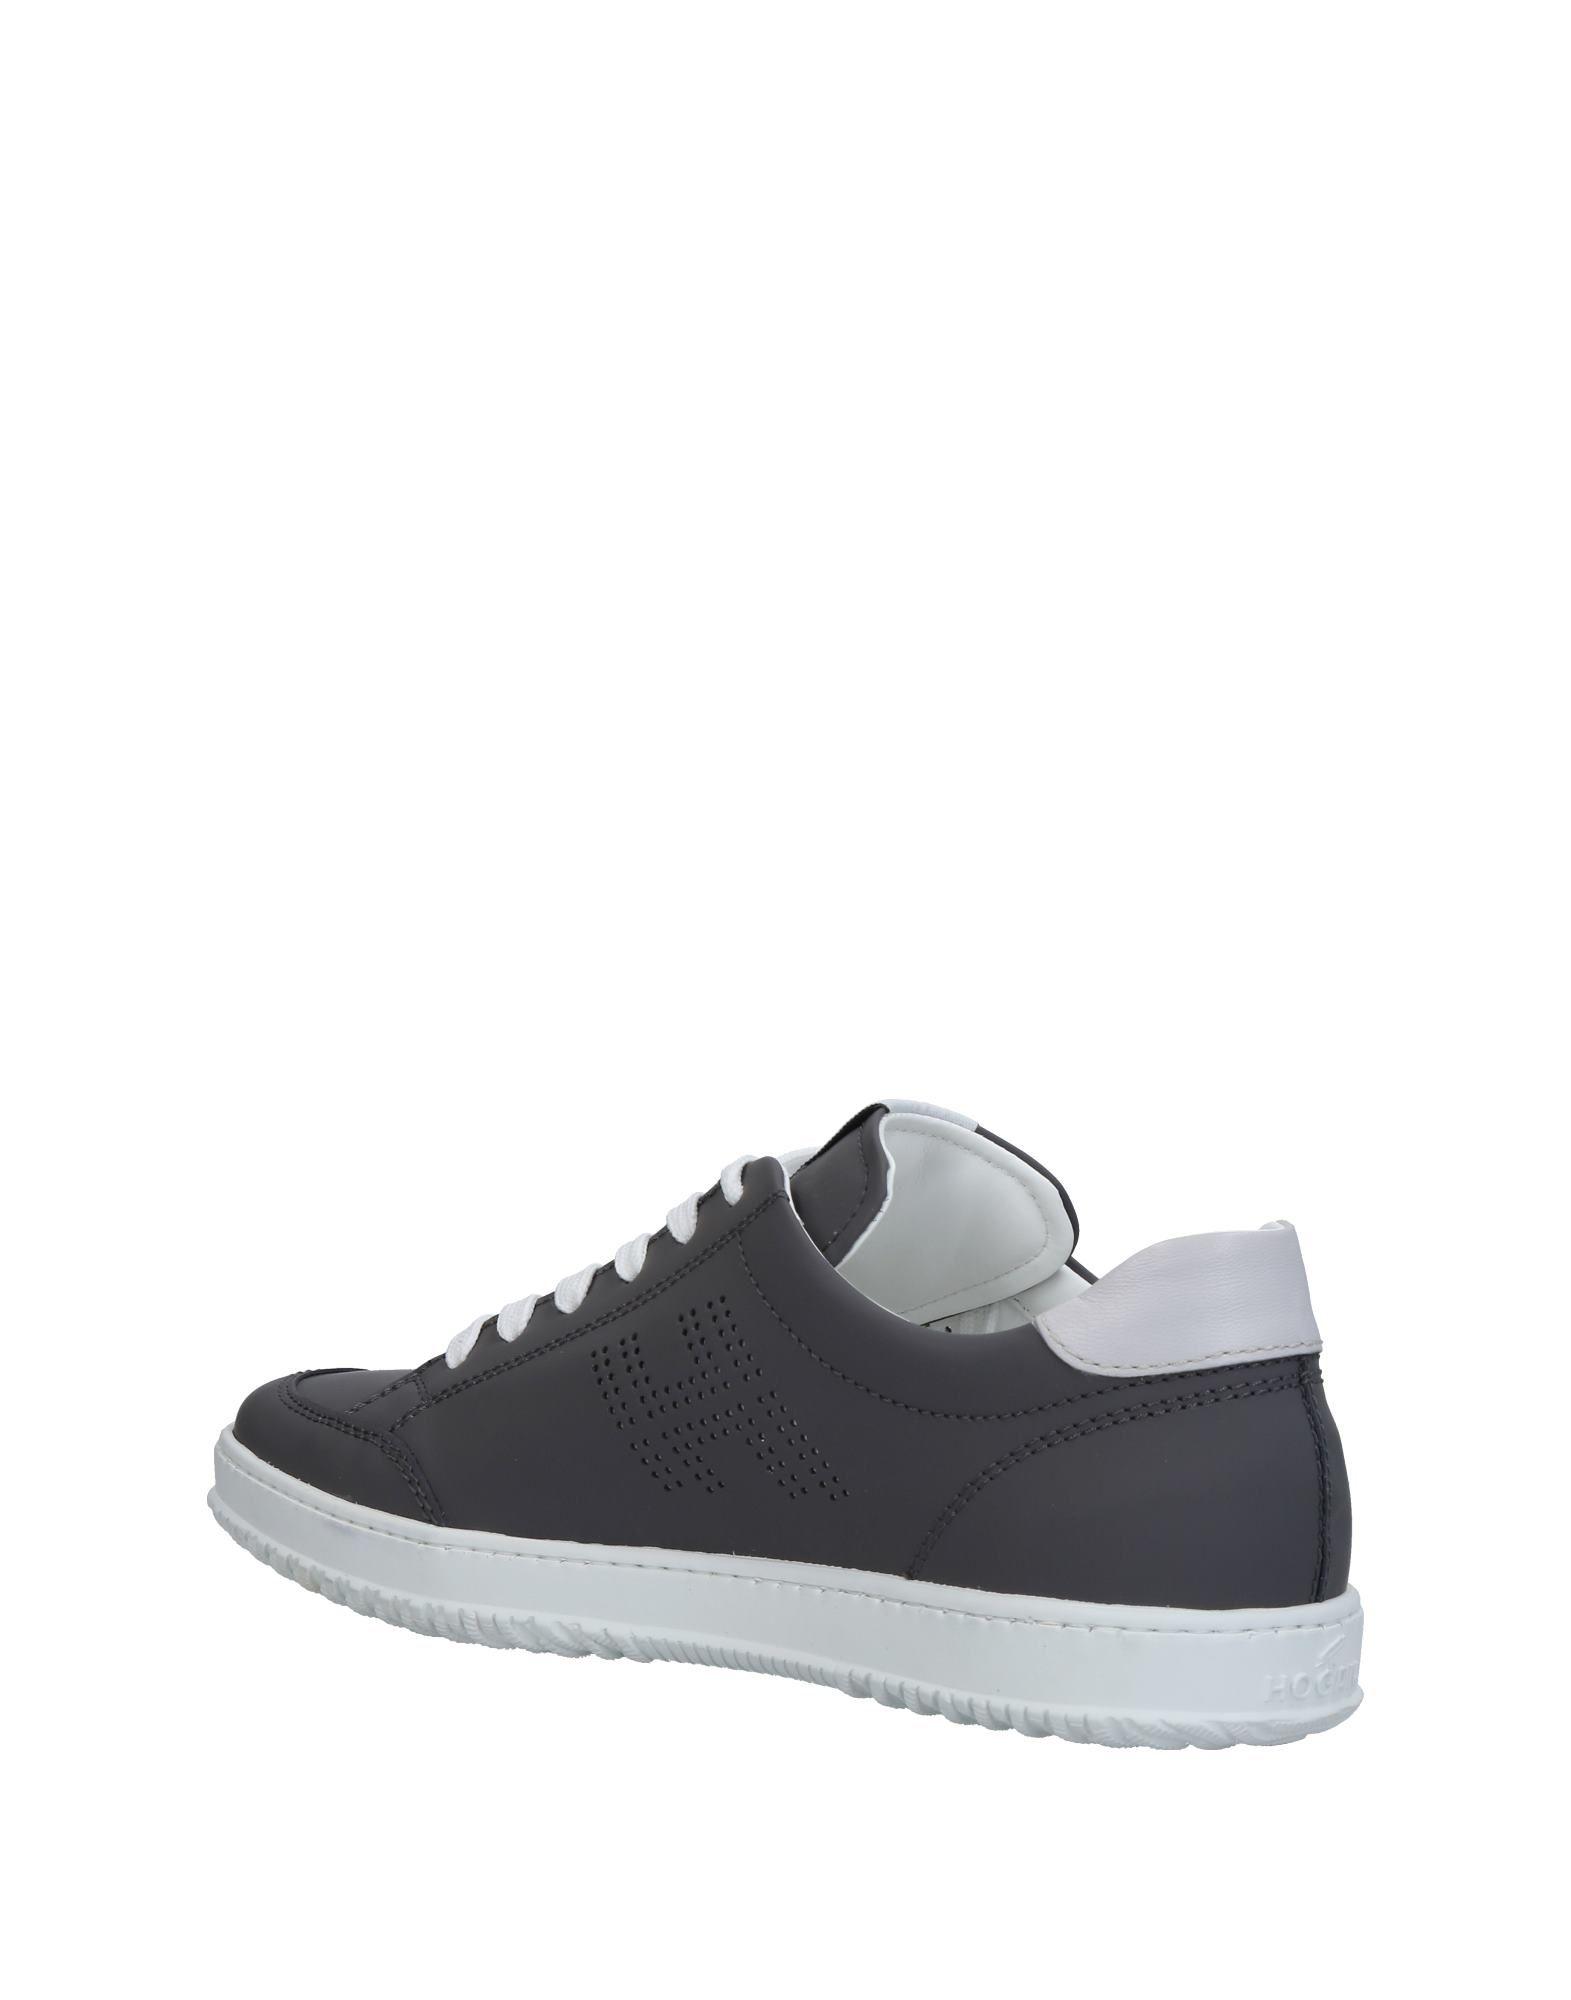 Hogan Sneakers Herren  Schuhe 11435558DC Heiße Schuhe  898387